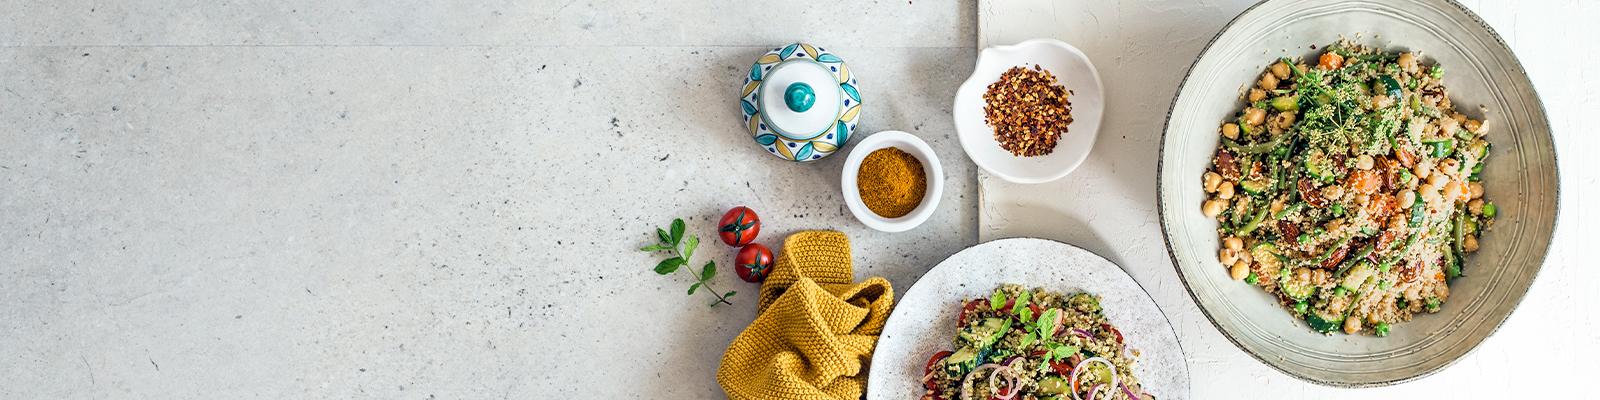 Pasta Garofalo - Just for a Change